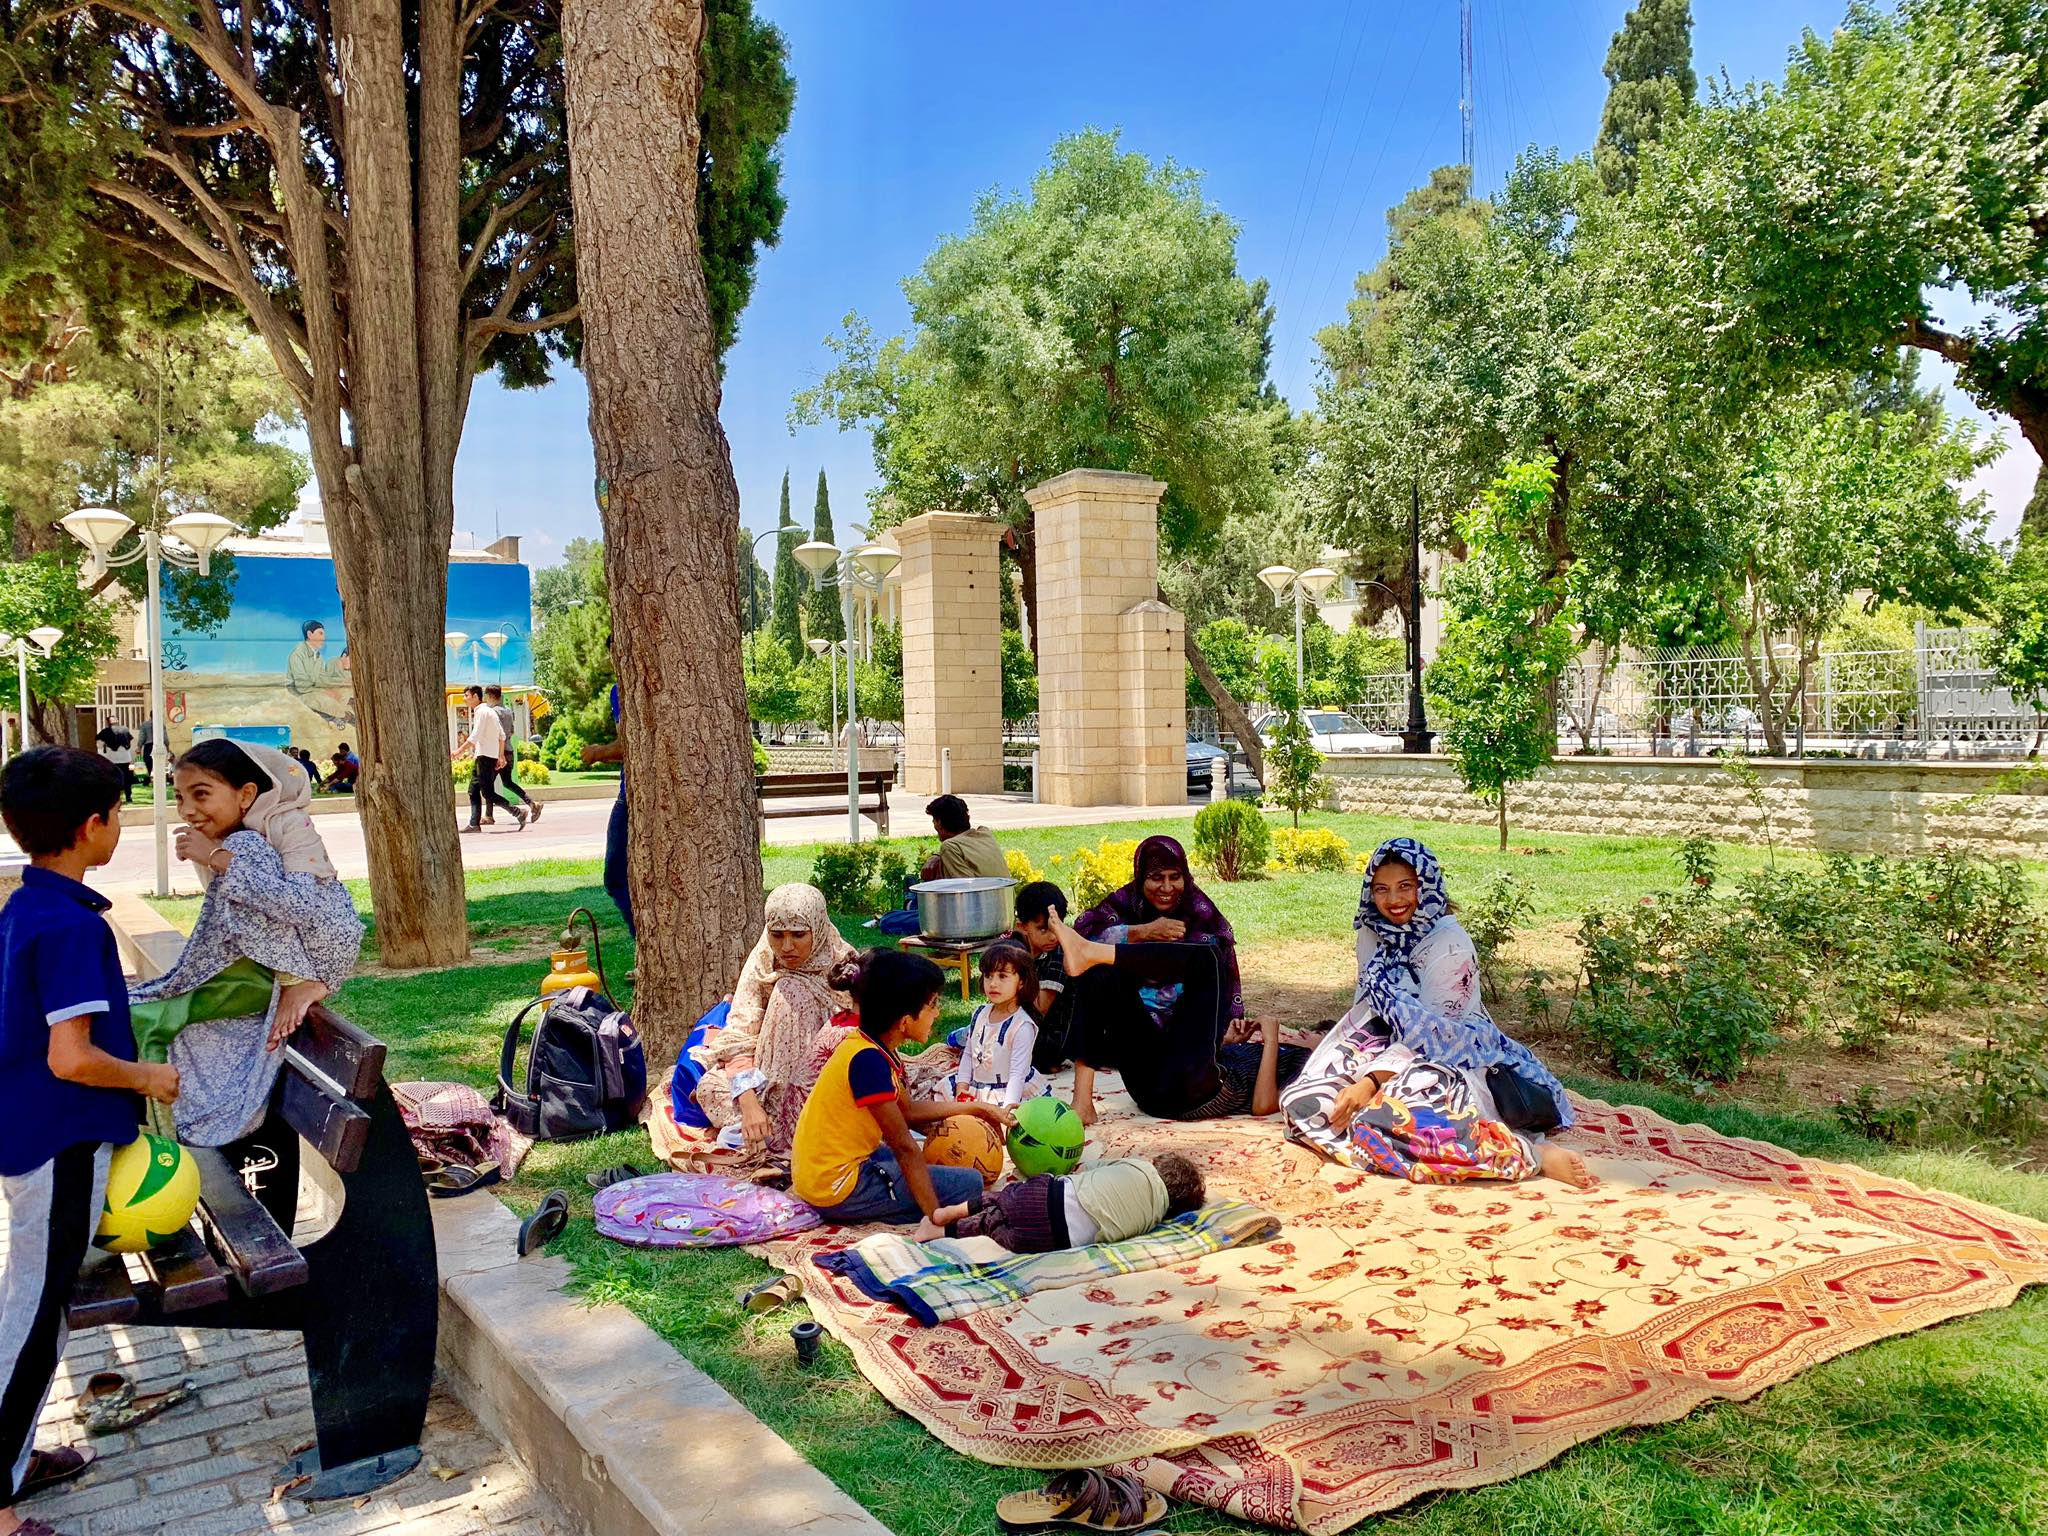 Kach Solo Travels in 2019 Mashhad to Shiraz24.jpg